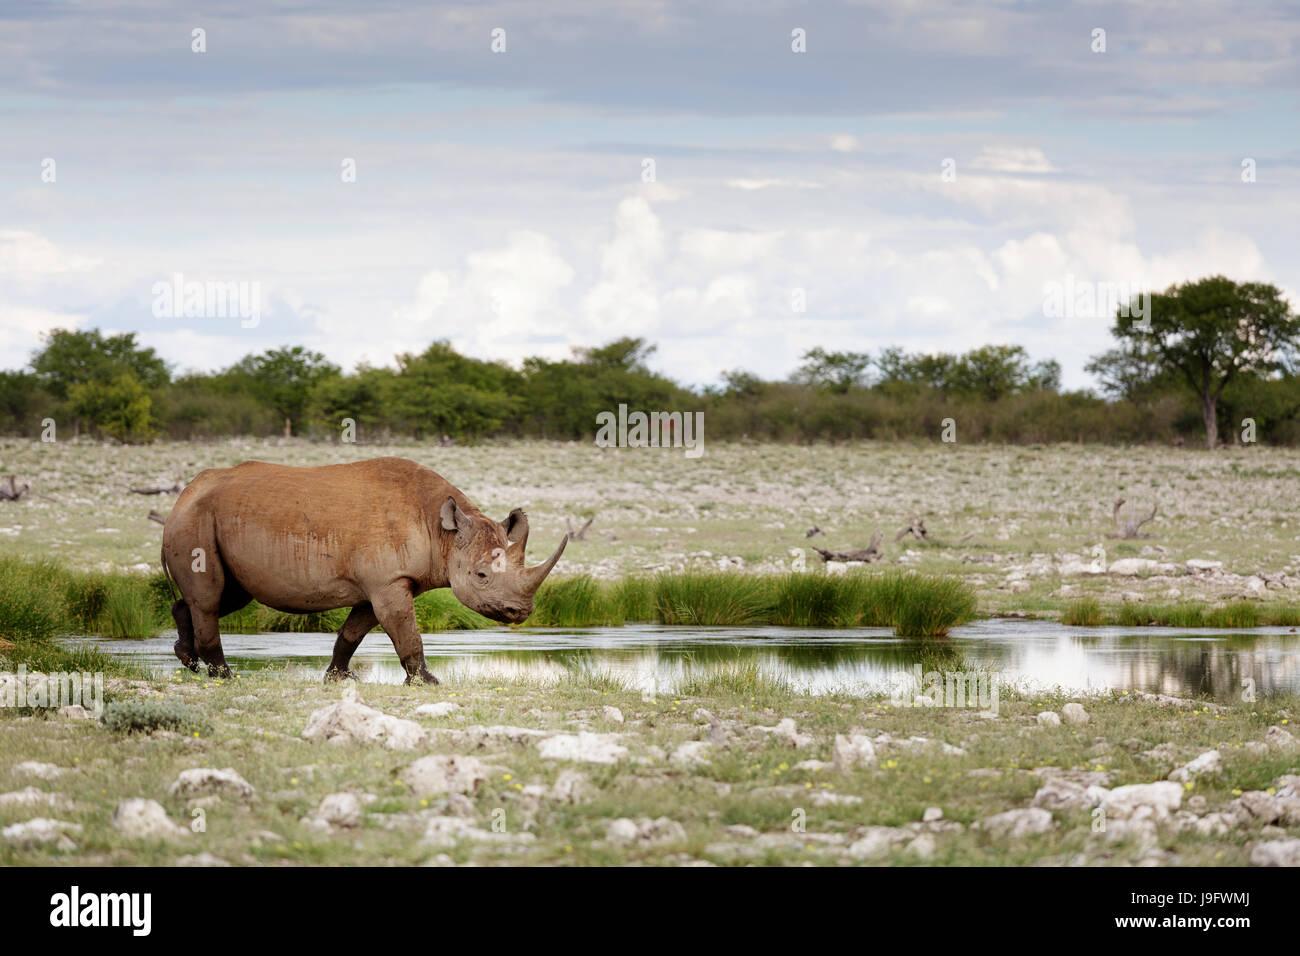 Rhino standing by a water hole, Etosha NP, Namibia. - Stock Image